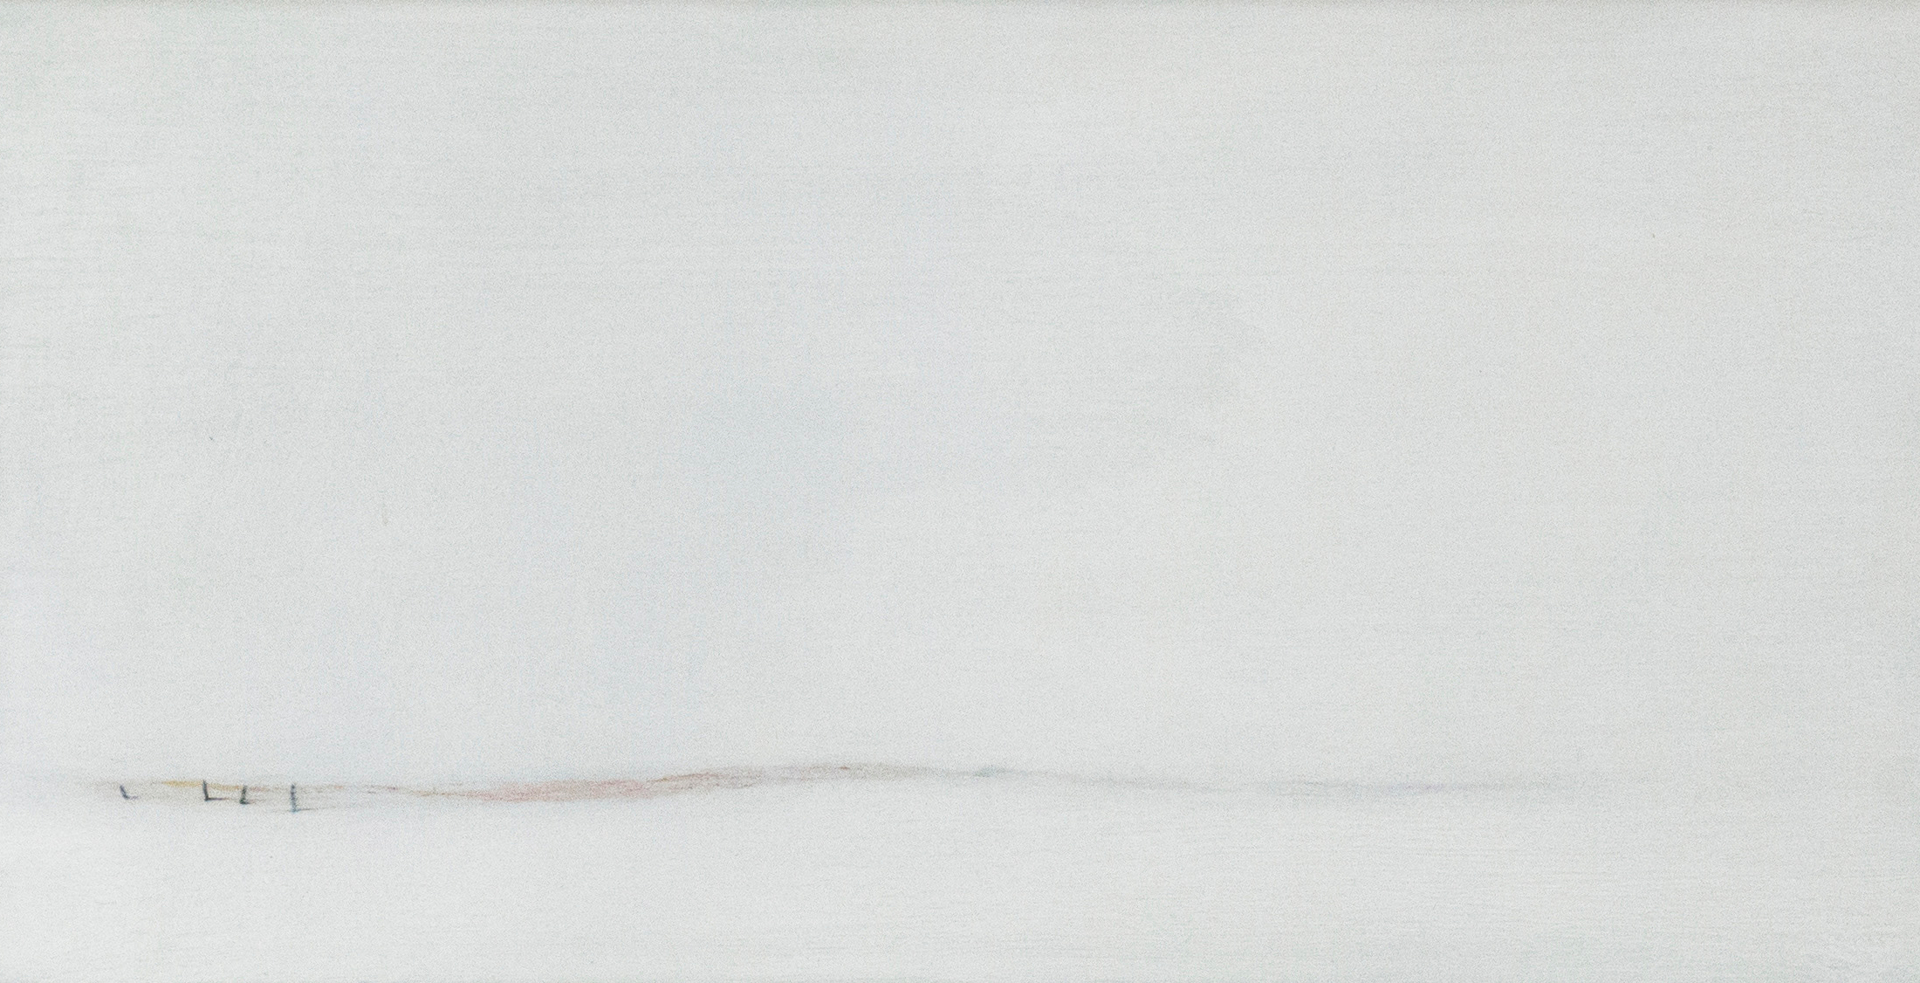 Silence by David Sebberson